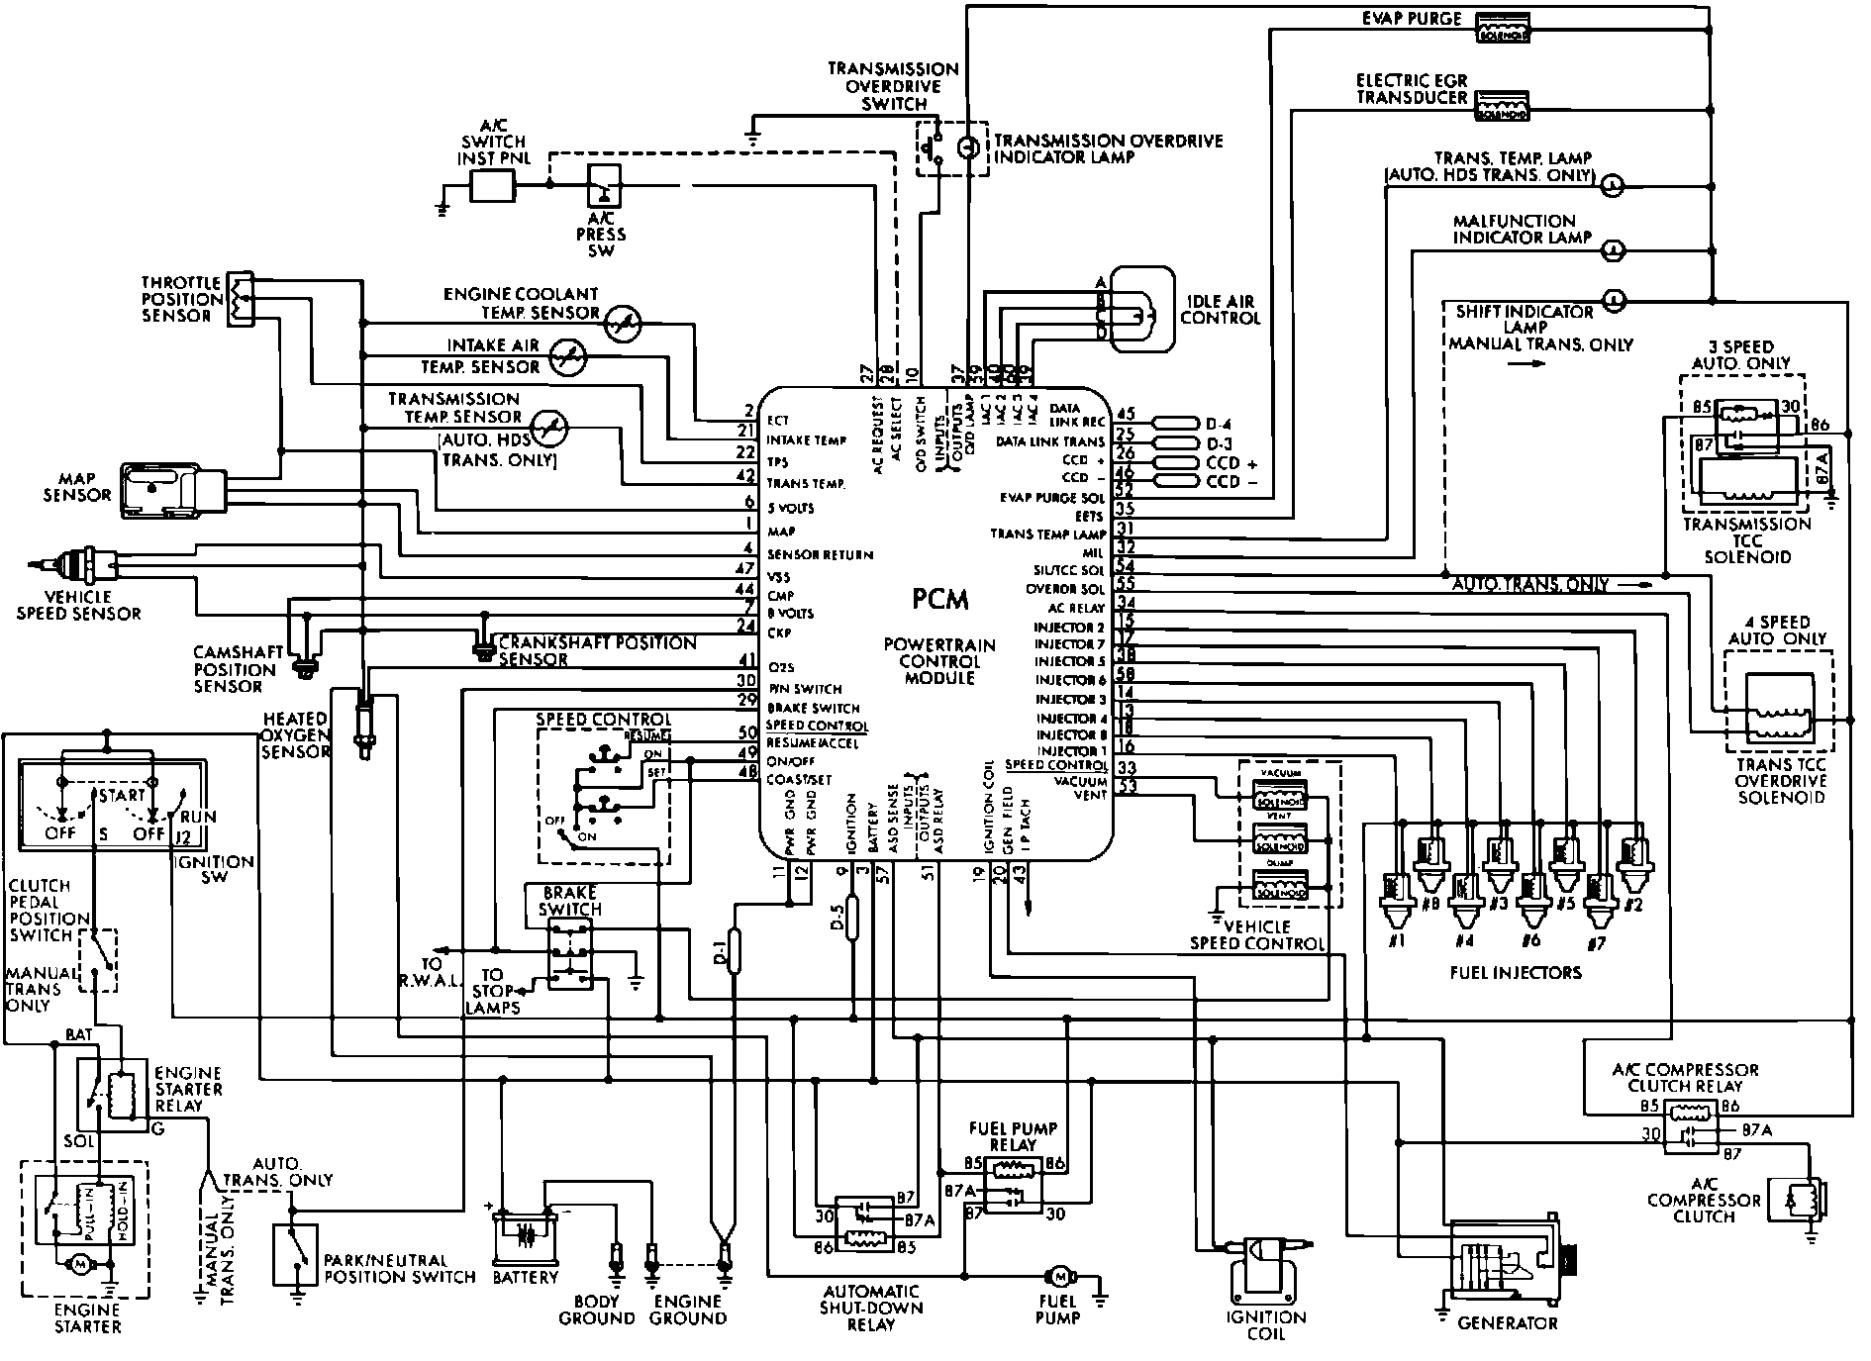 gen tran wiring diagram elegant cummins fuel shut f wiring trusted schematic diagrams